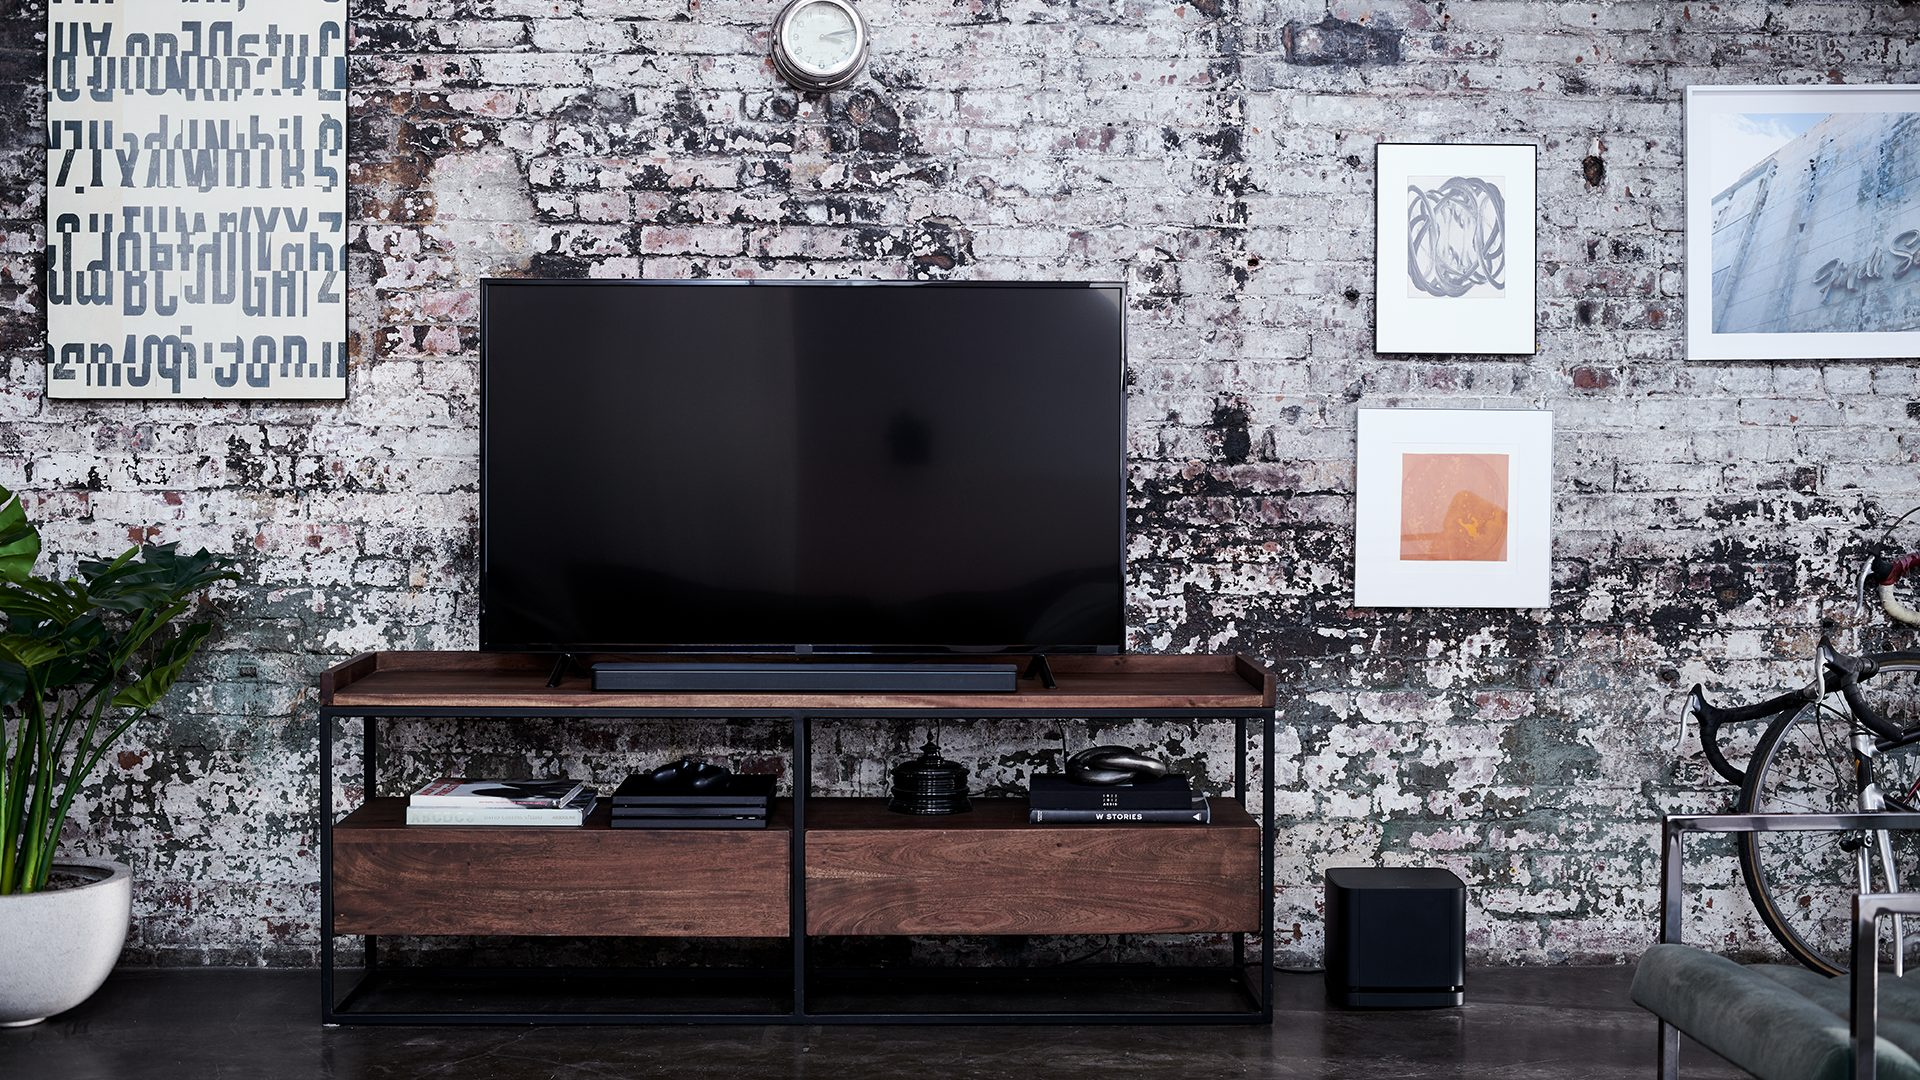 Bose Soundbar 700 with a TV and the Bose Bass Module 500